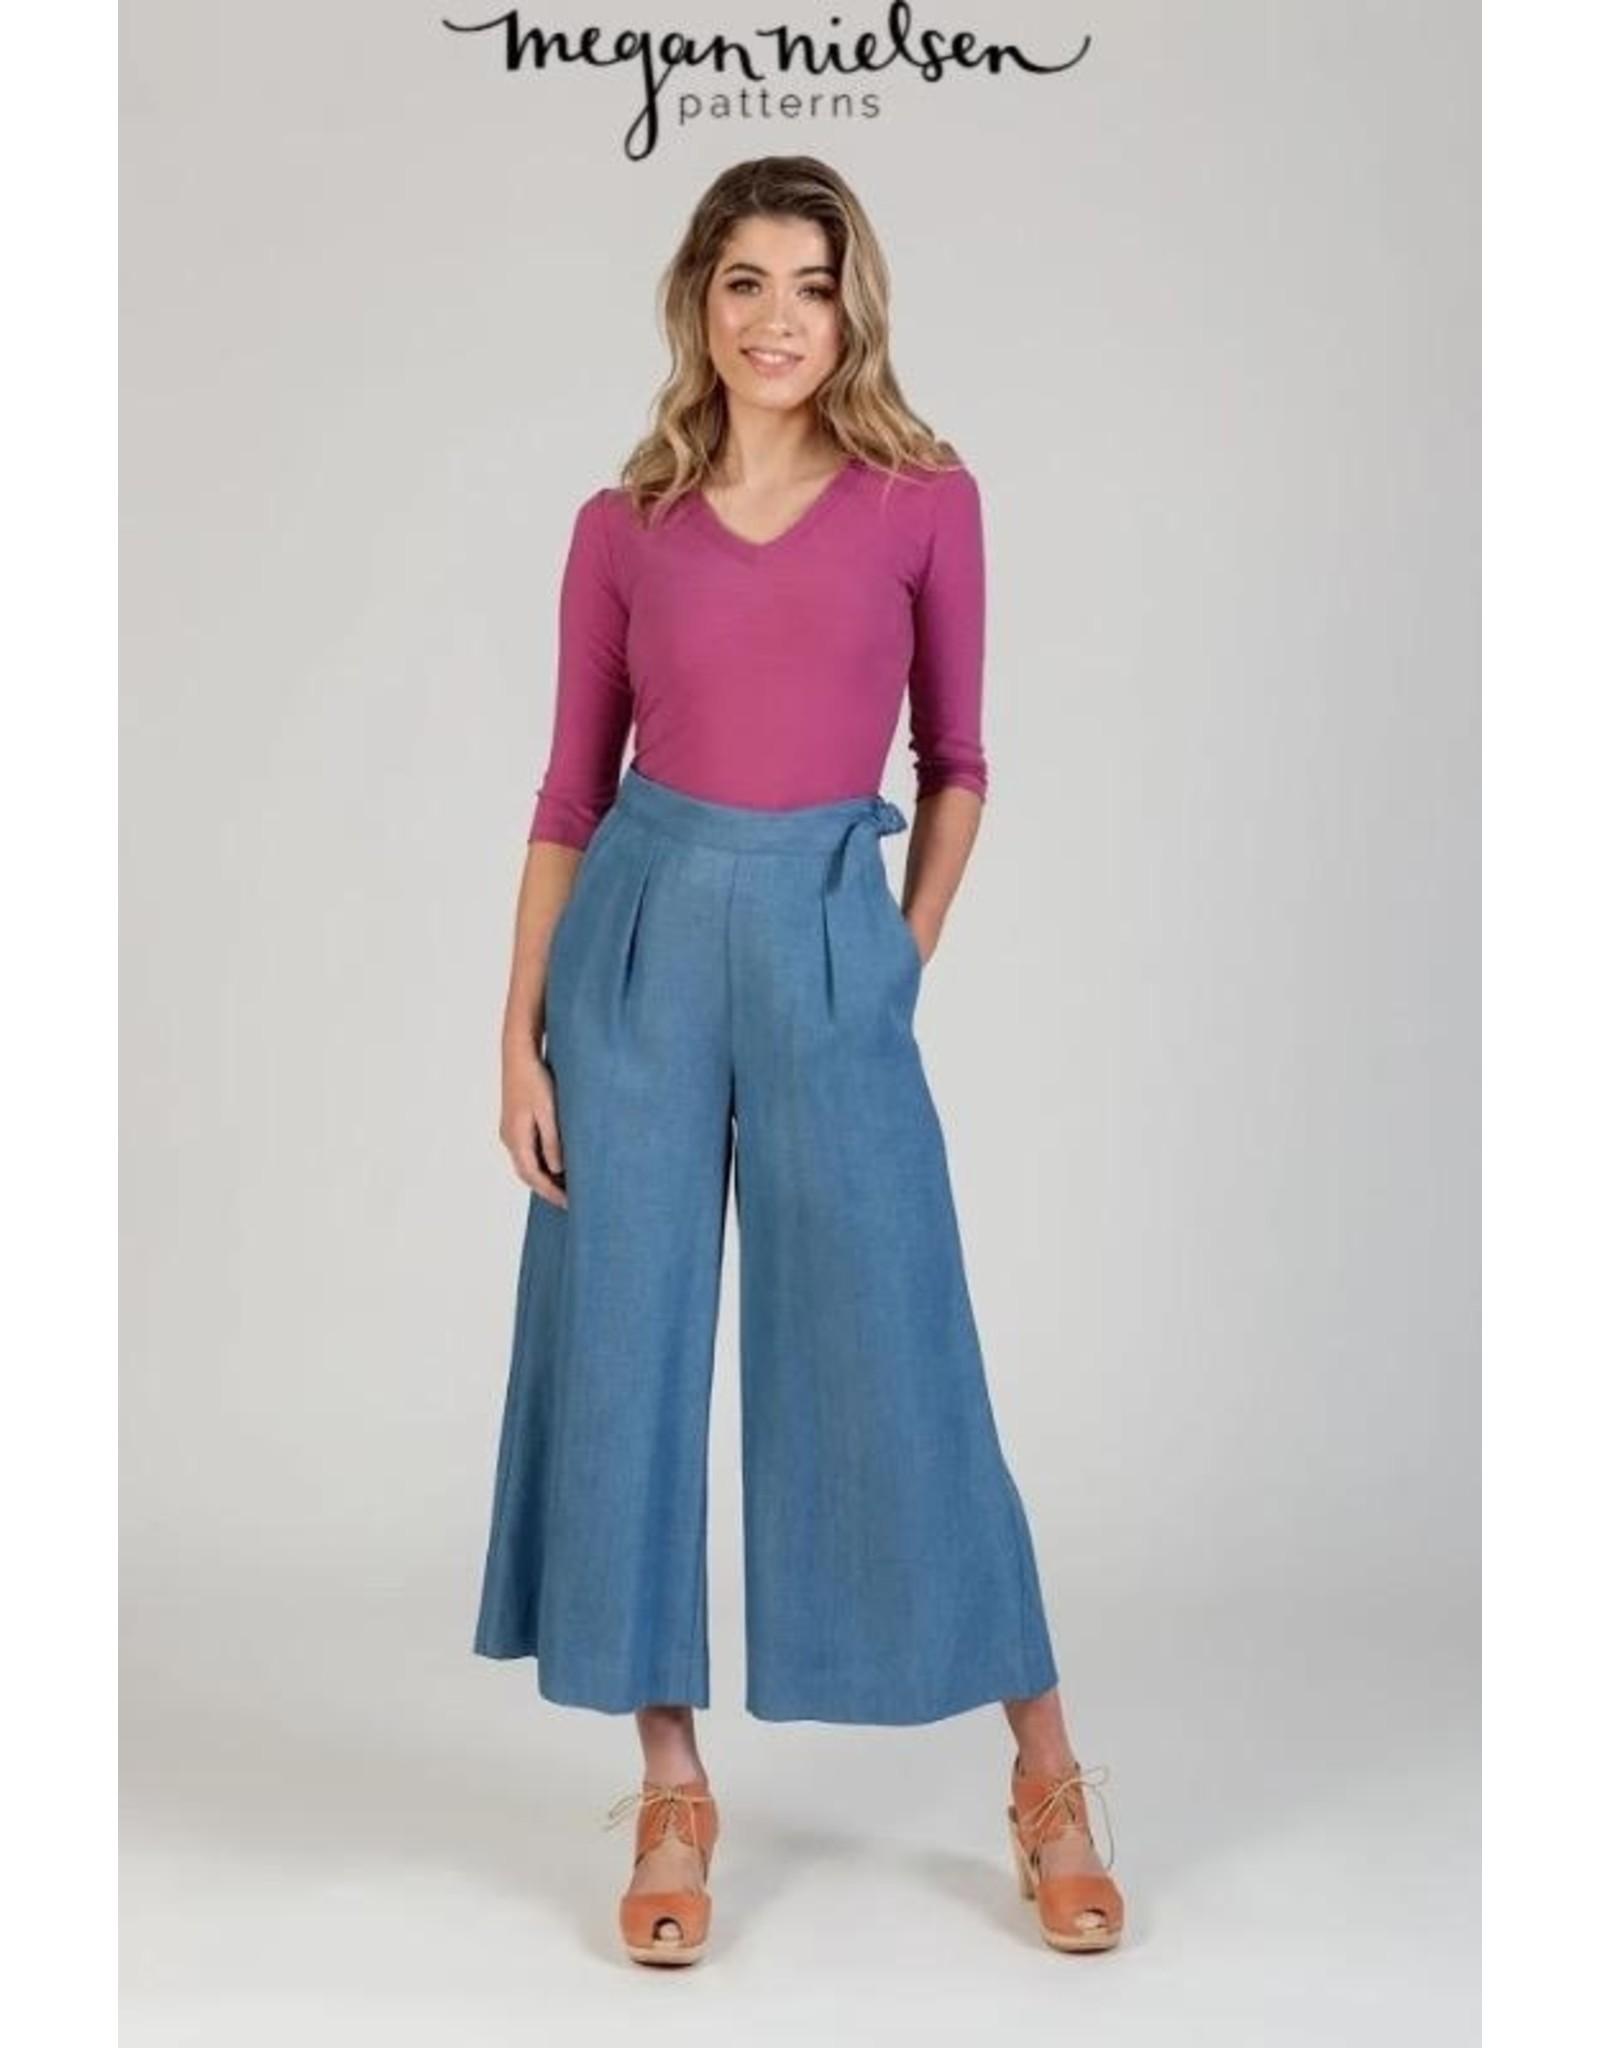 Megan Nielsen Megan Nielsen's Flint Pants & Shorts, Paper Pattern MN2210